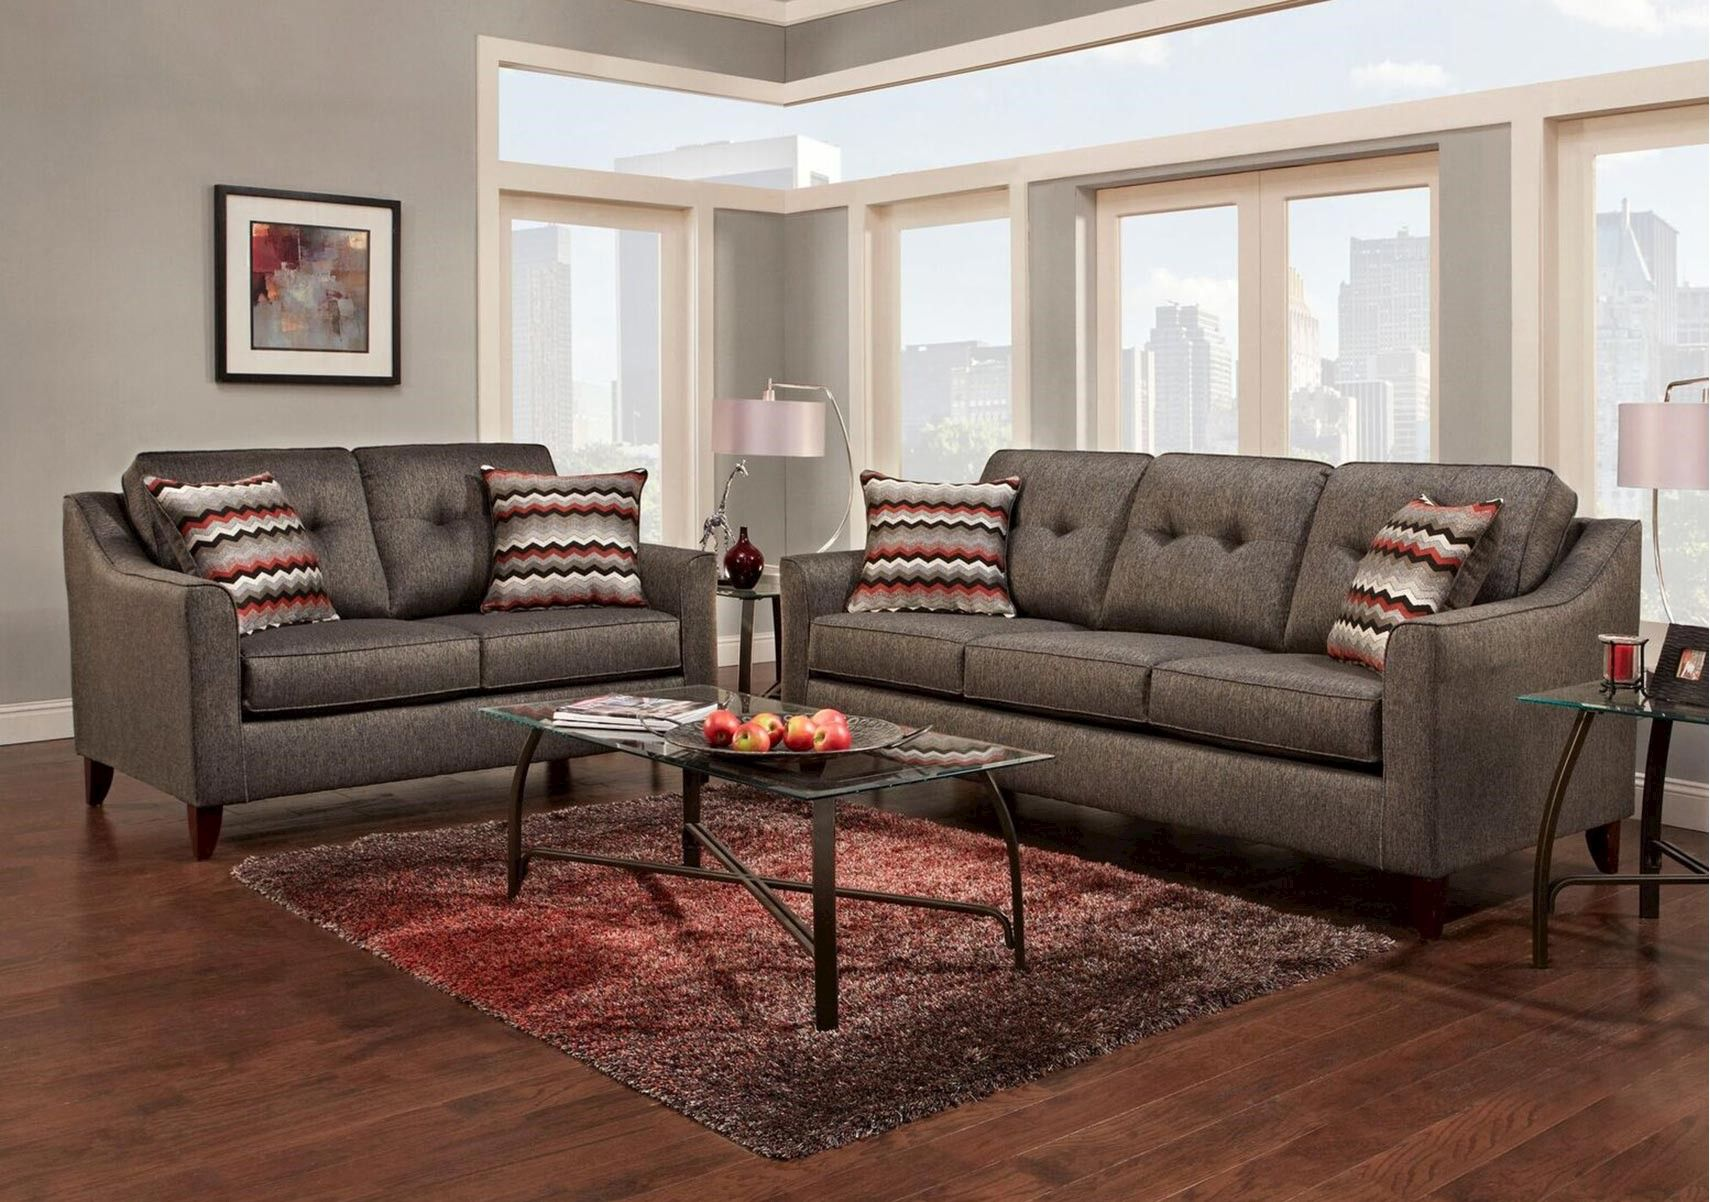 Lacks I S Queen Sleeper Sofa Small Spaces